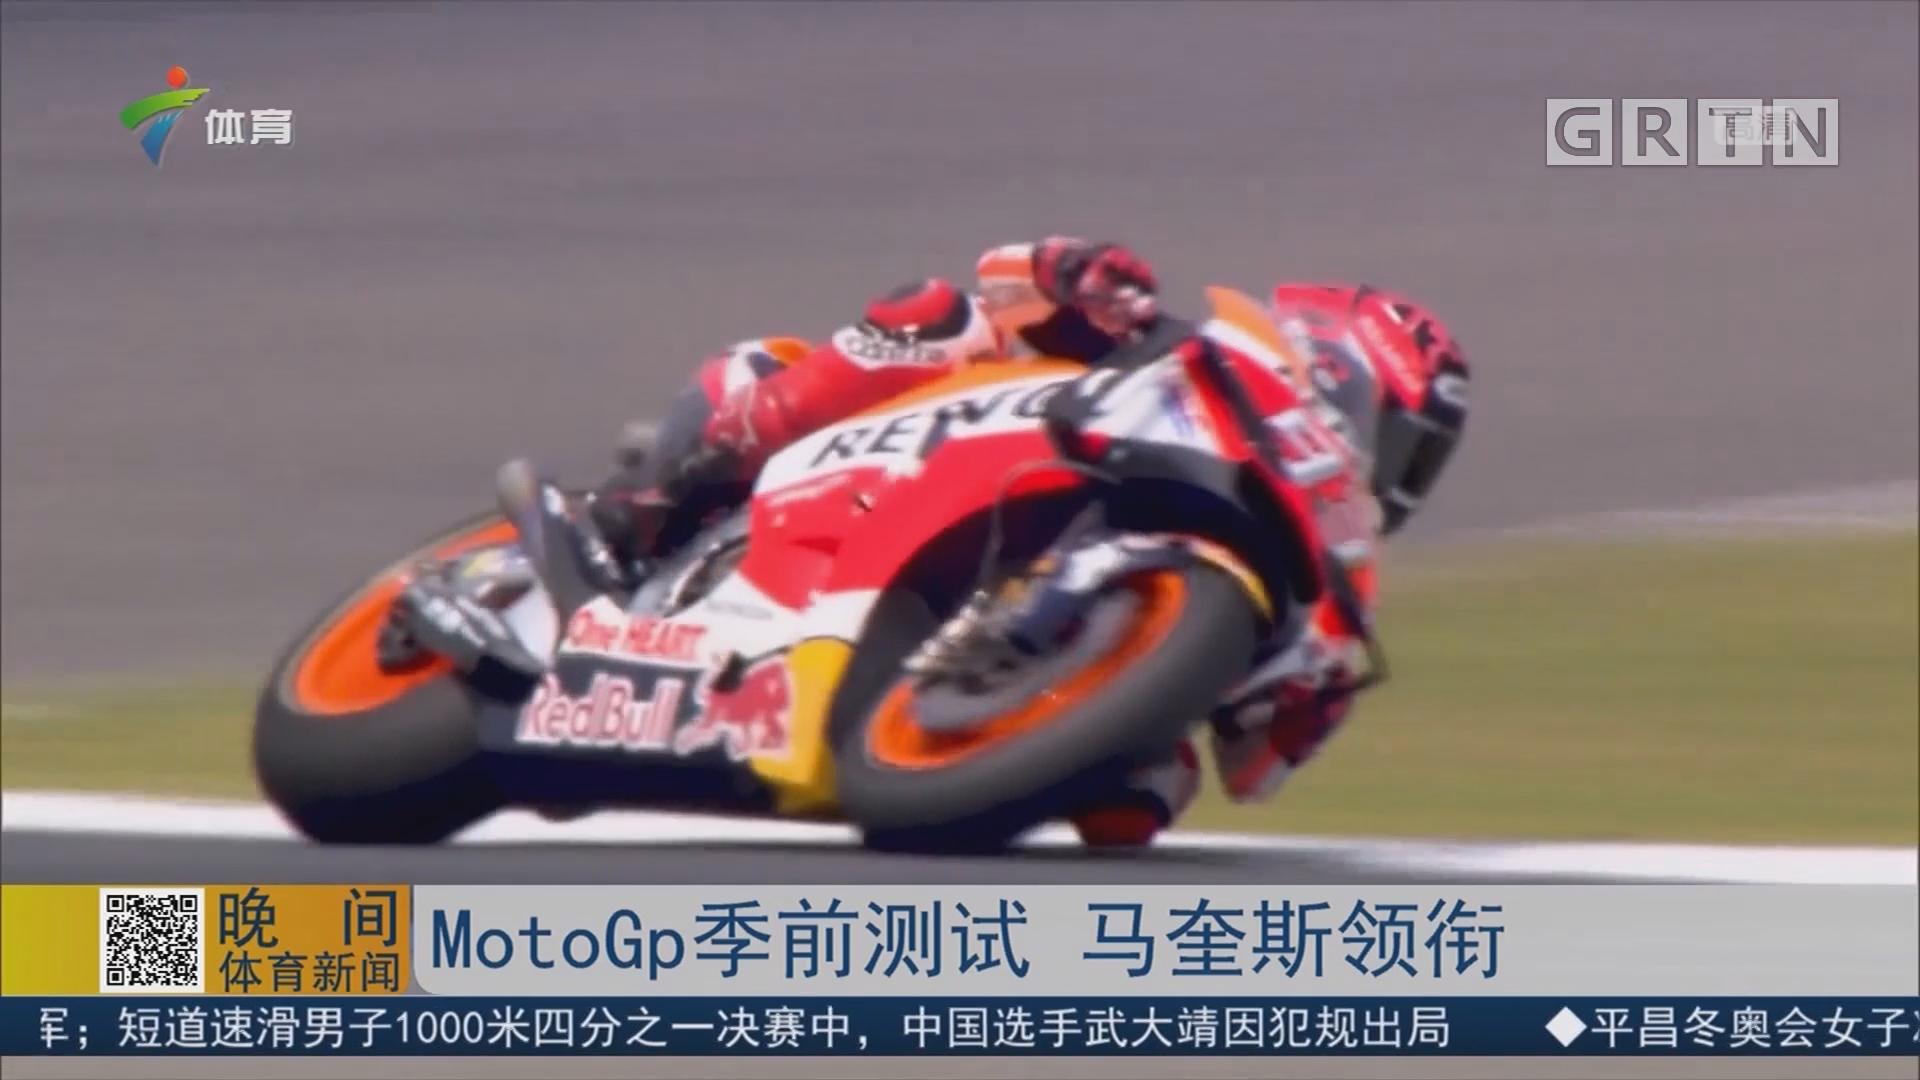 MotoGp季前测试 马奎斯领衔